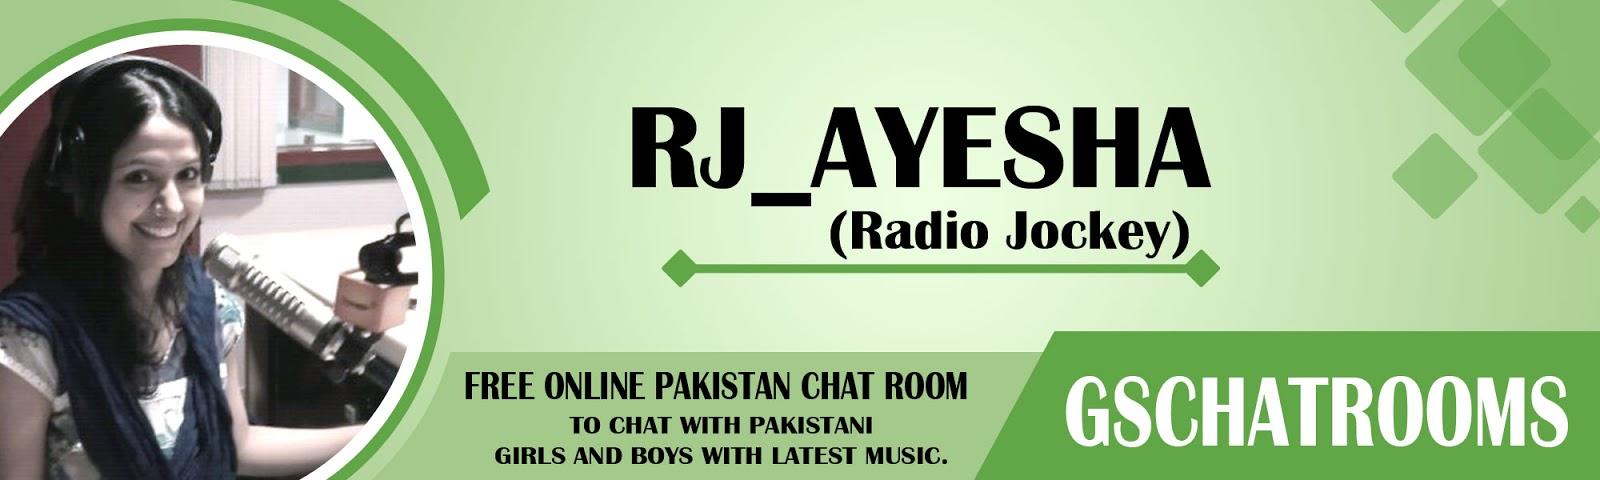 Pakistani Chat Room